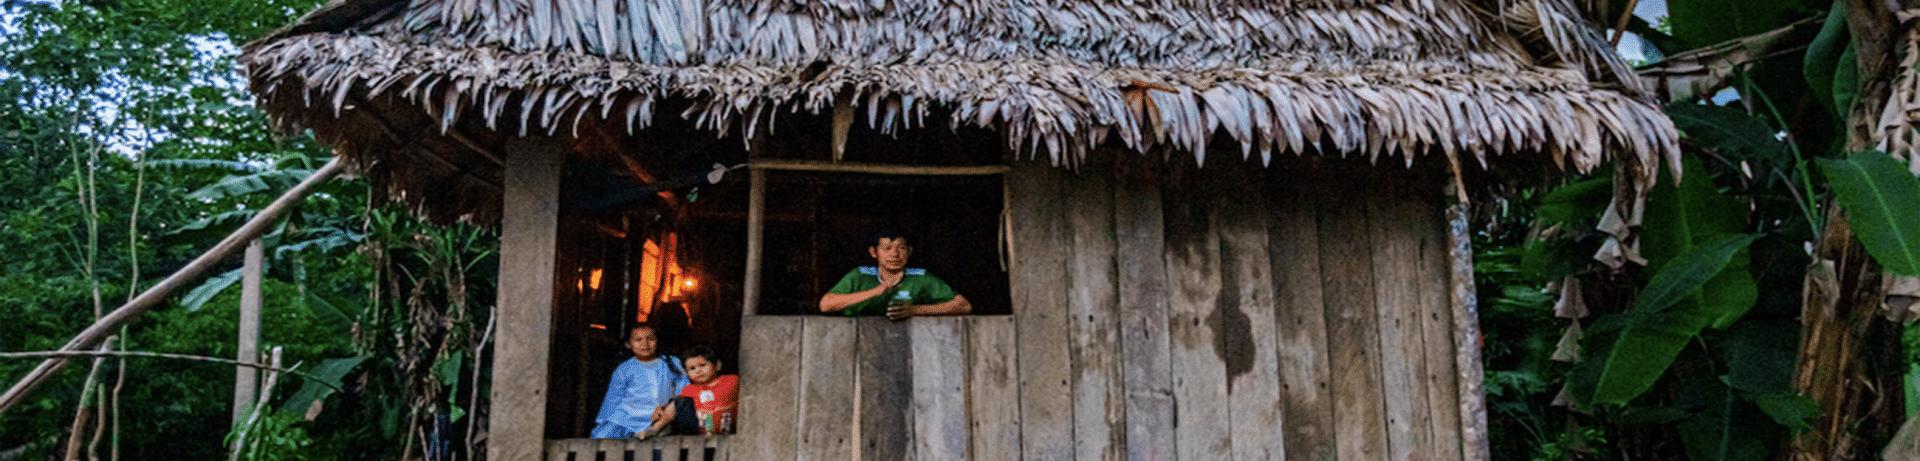 Puerto Miguel iquitos